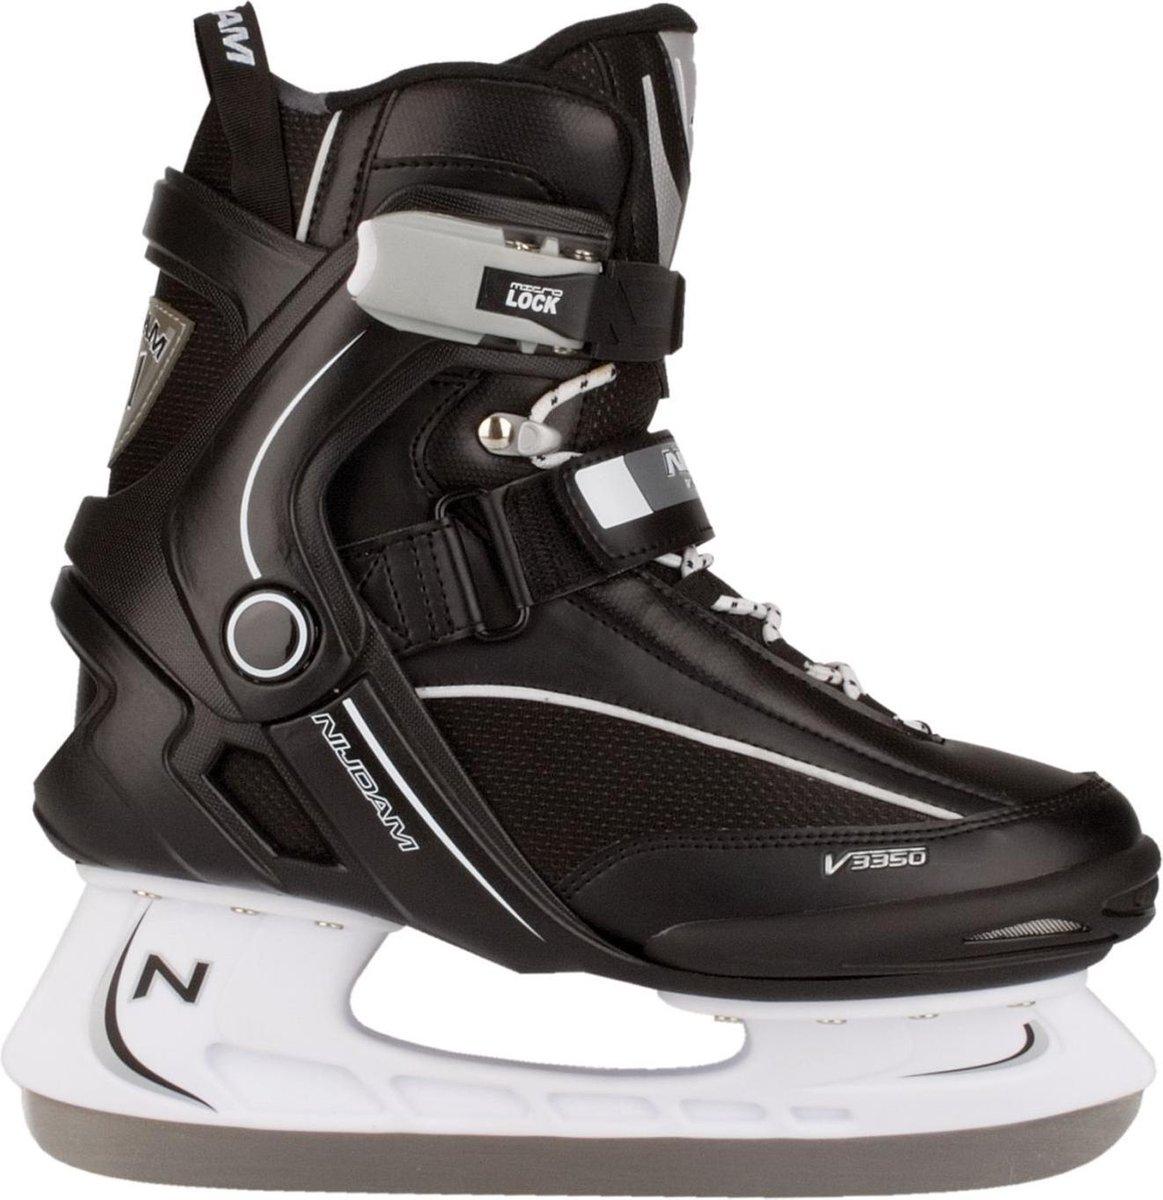 NijdamIJshockeyschaats - Semi-Softboot - Zwart/Wit - Maat 41